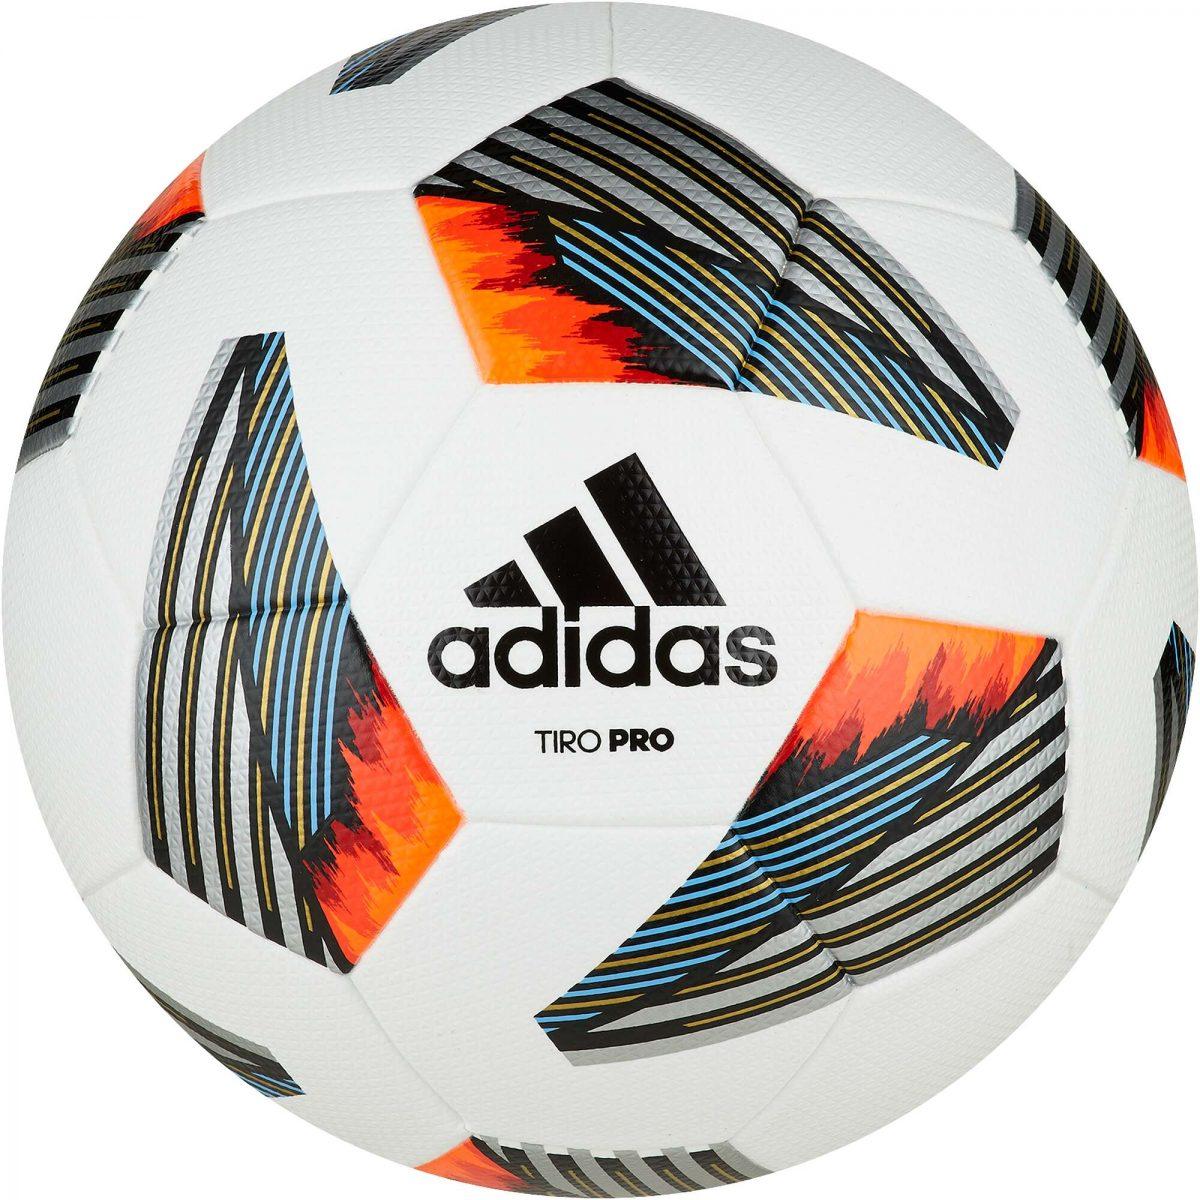 "Adidas Fußball ""Tiro Pro"" - Bälle - Adidas"